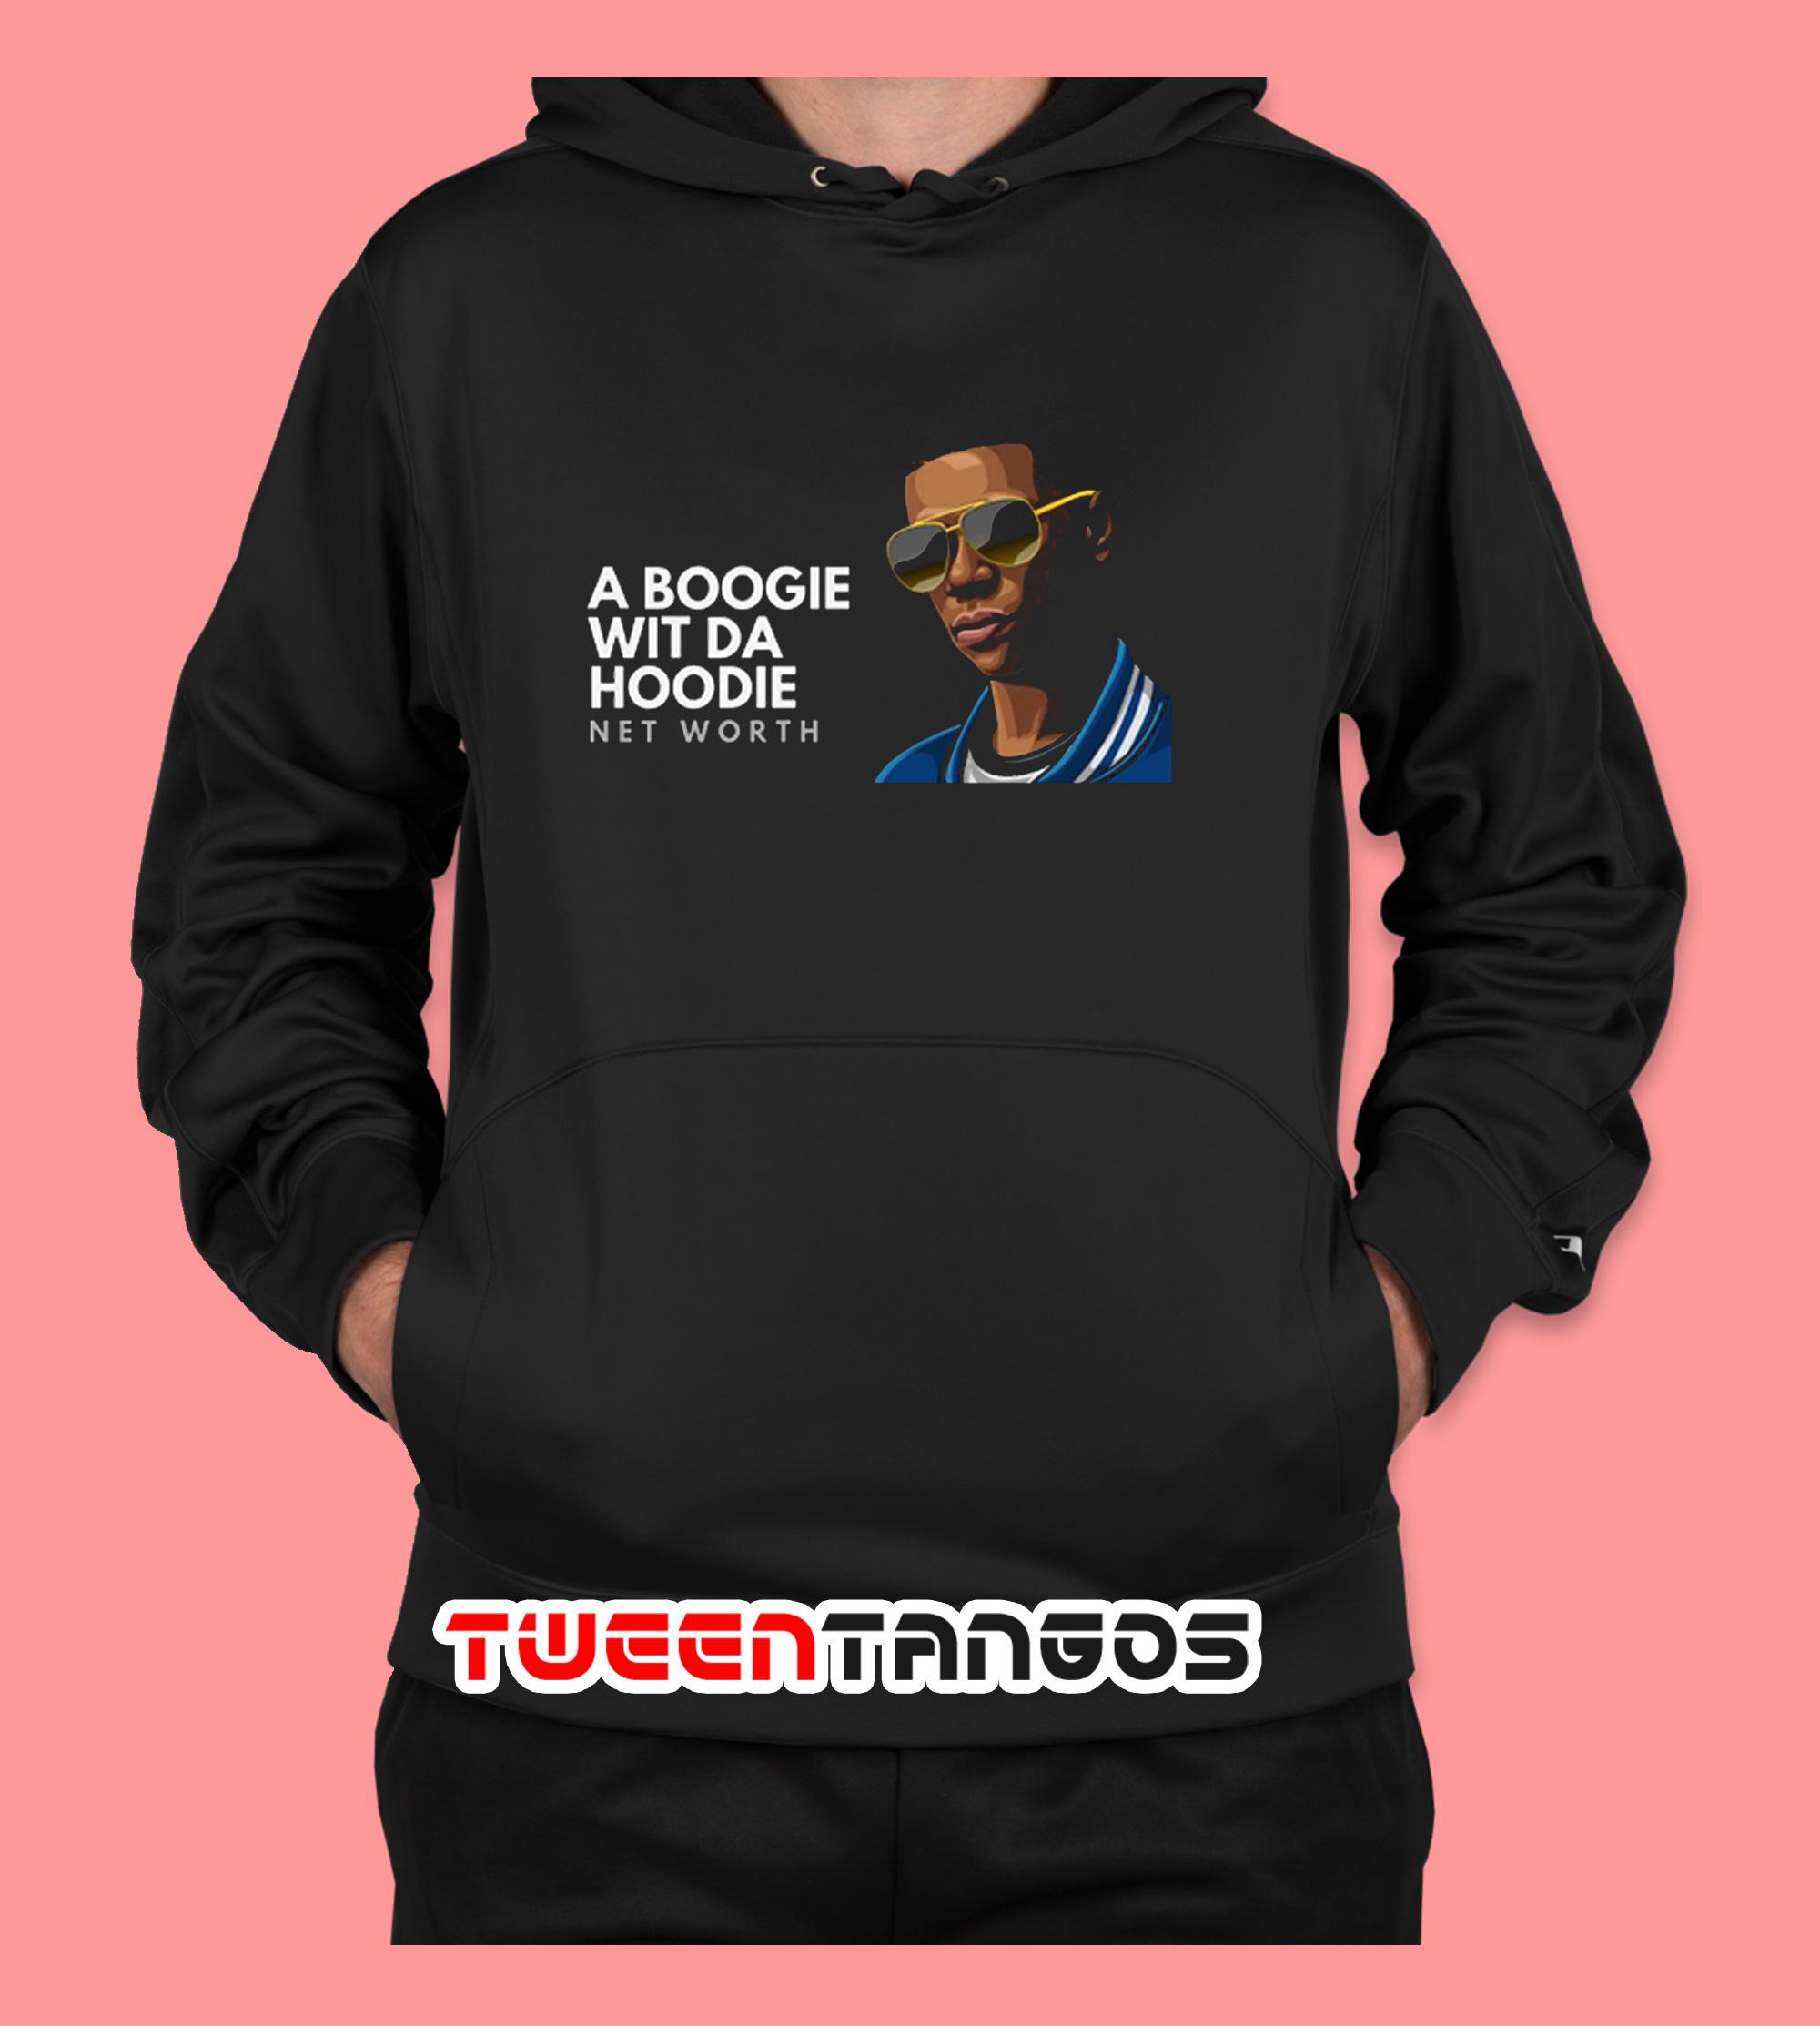 A Boogie Wit Da Hoodie Net Worth Hoodie